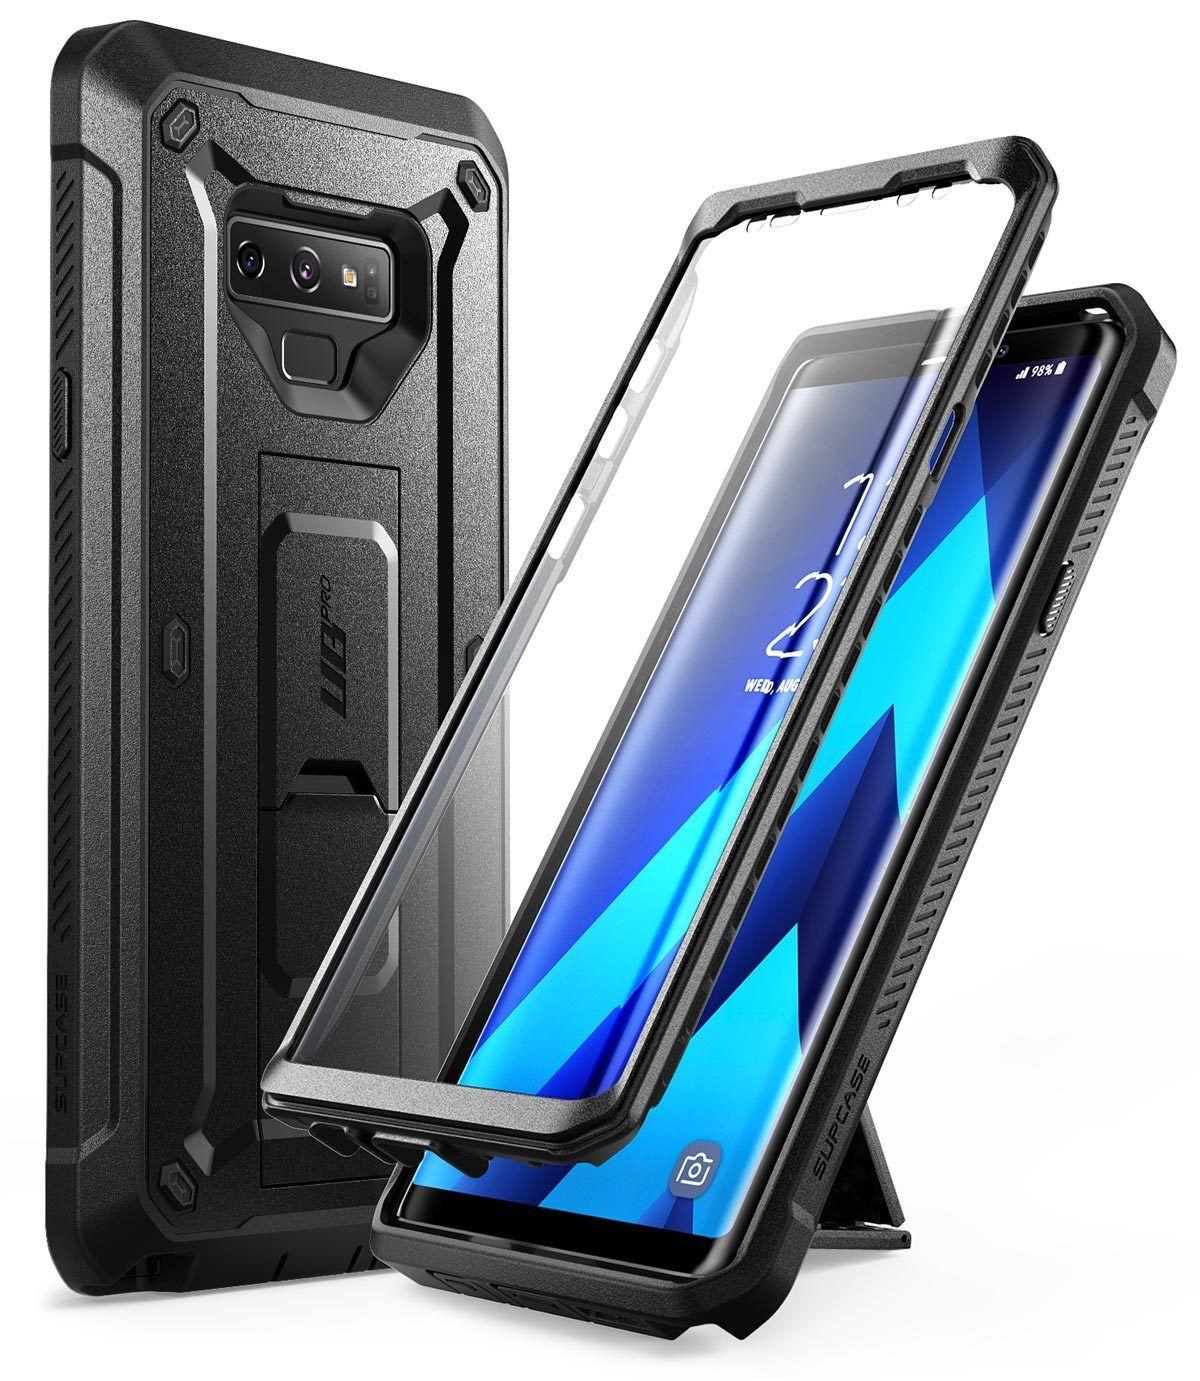 Galaxy Note 4 Case SUPCASE [Heavy Duty